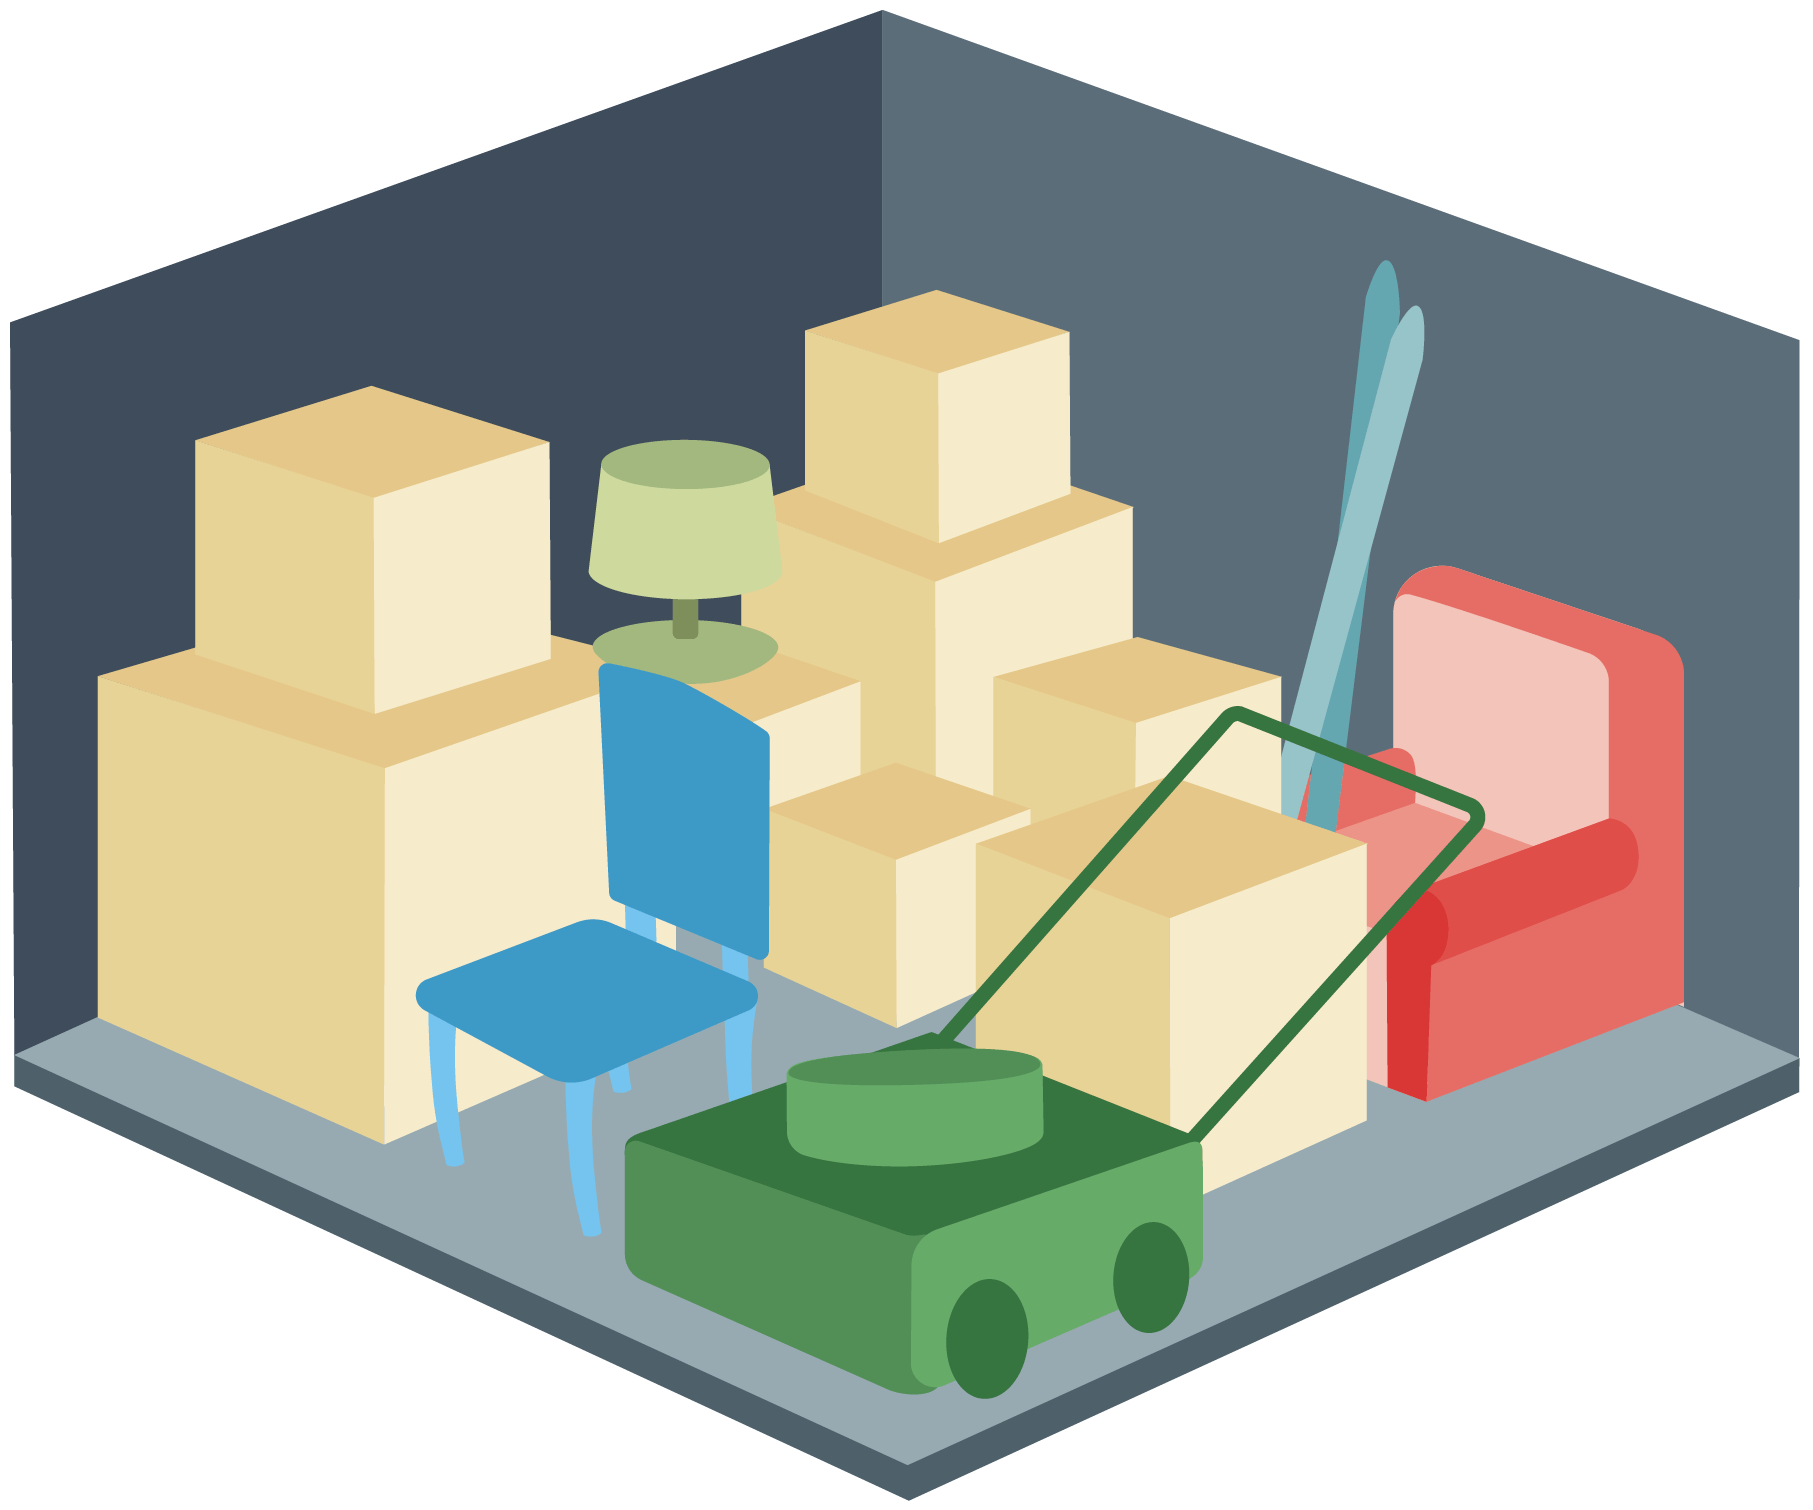 Storage desktop backgrounds self. Factory clipart manufacturing unit